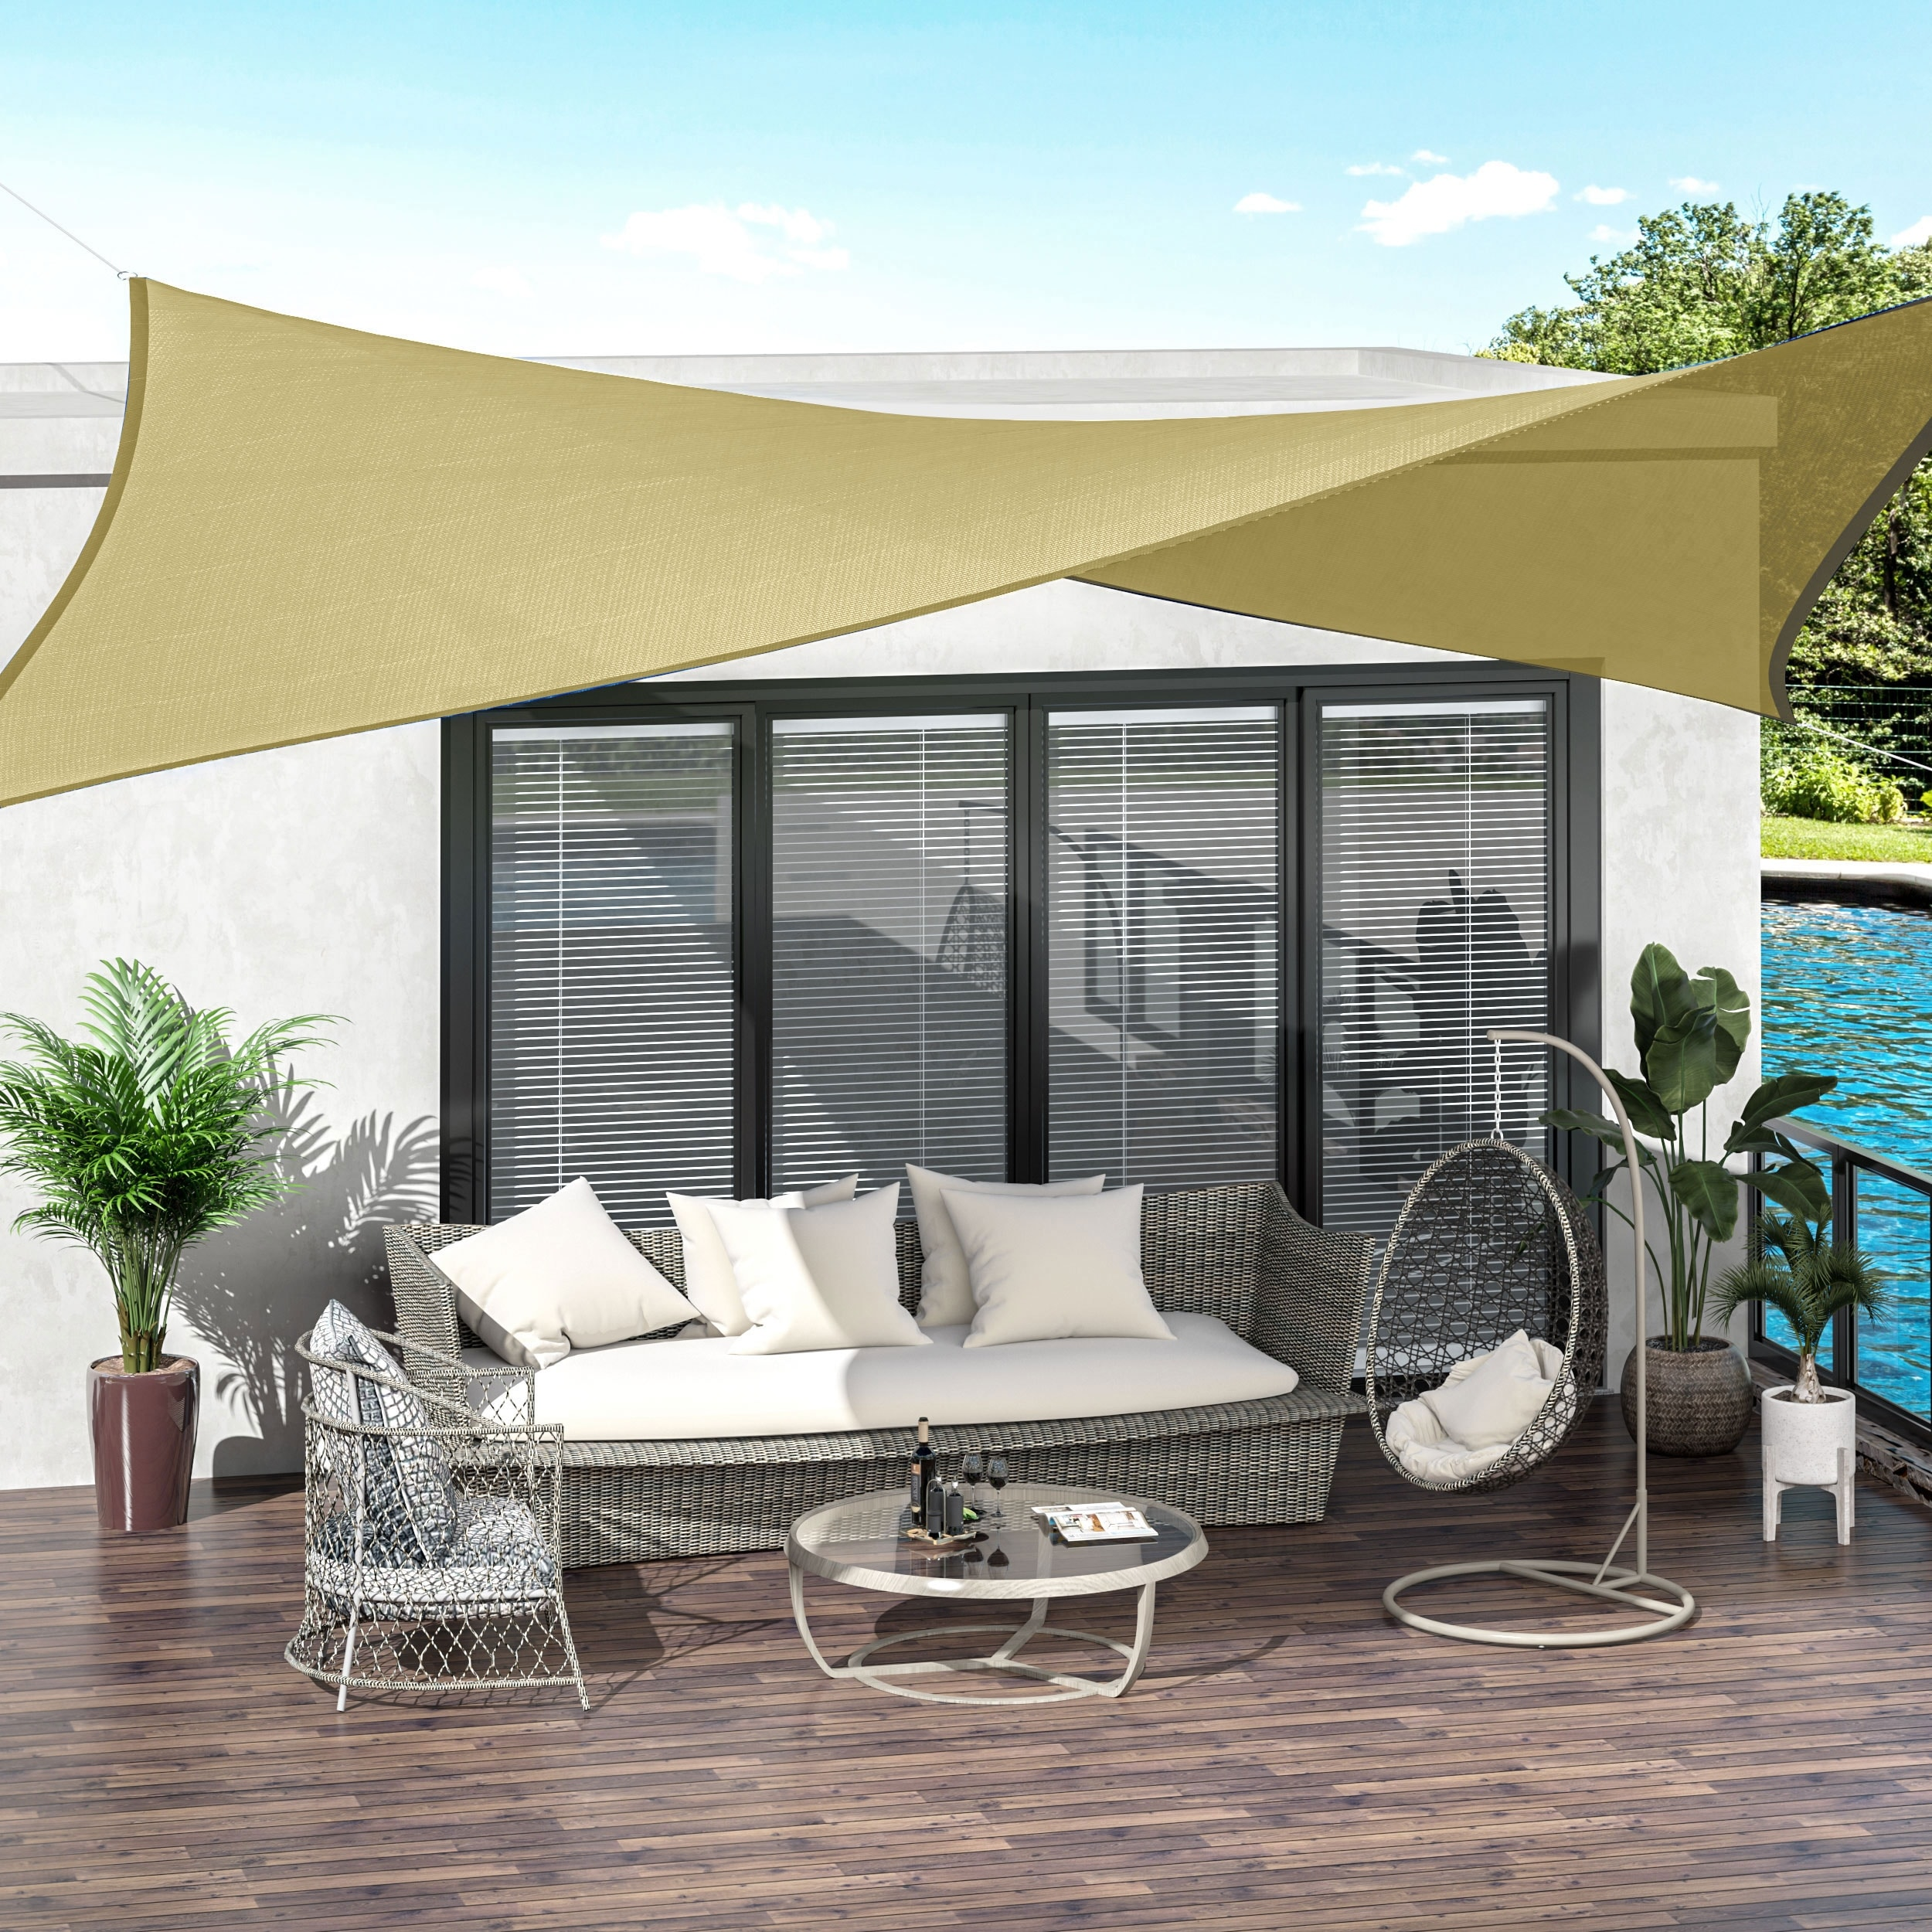 outsunny 20 x 16 rectangle outdoor patio sun shade sail canopy